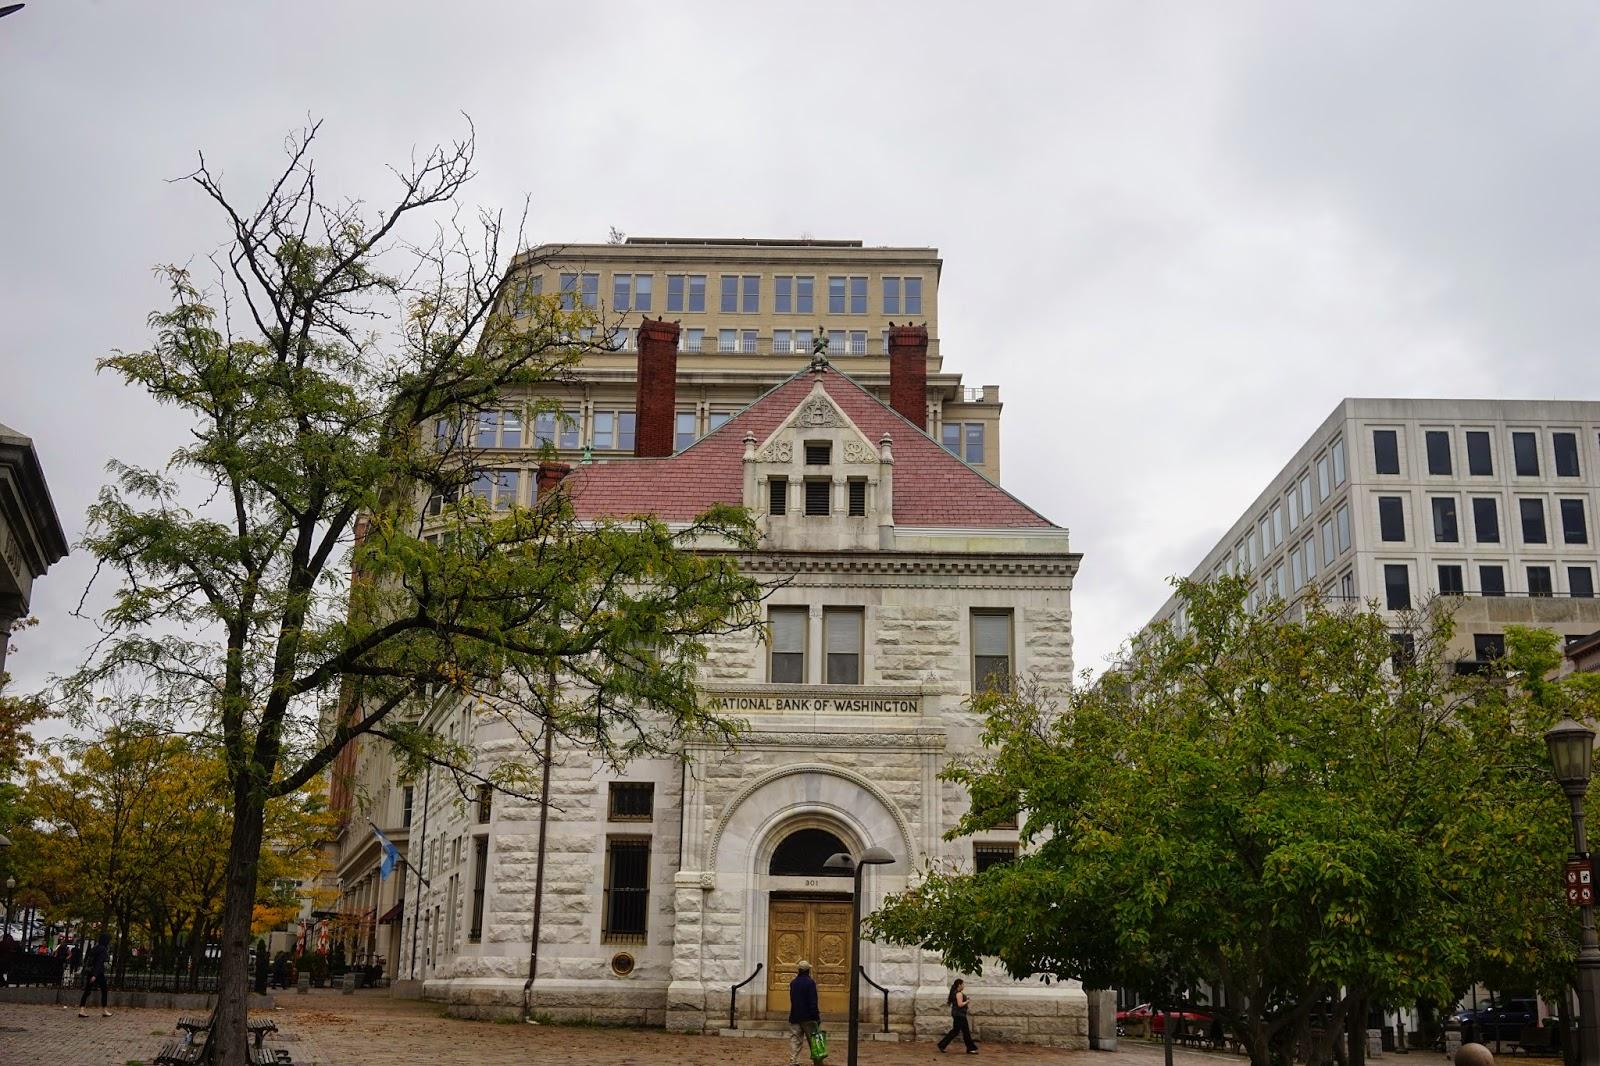 old washington d.c bank